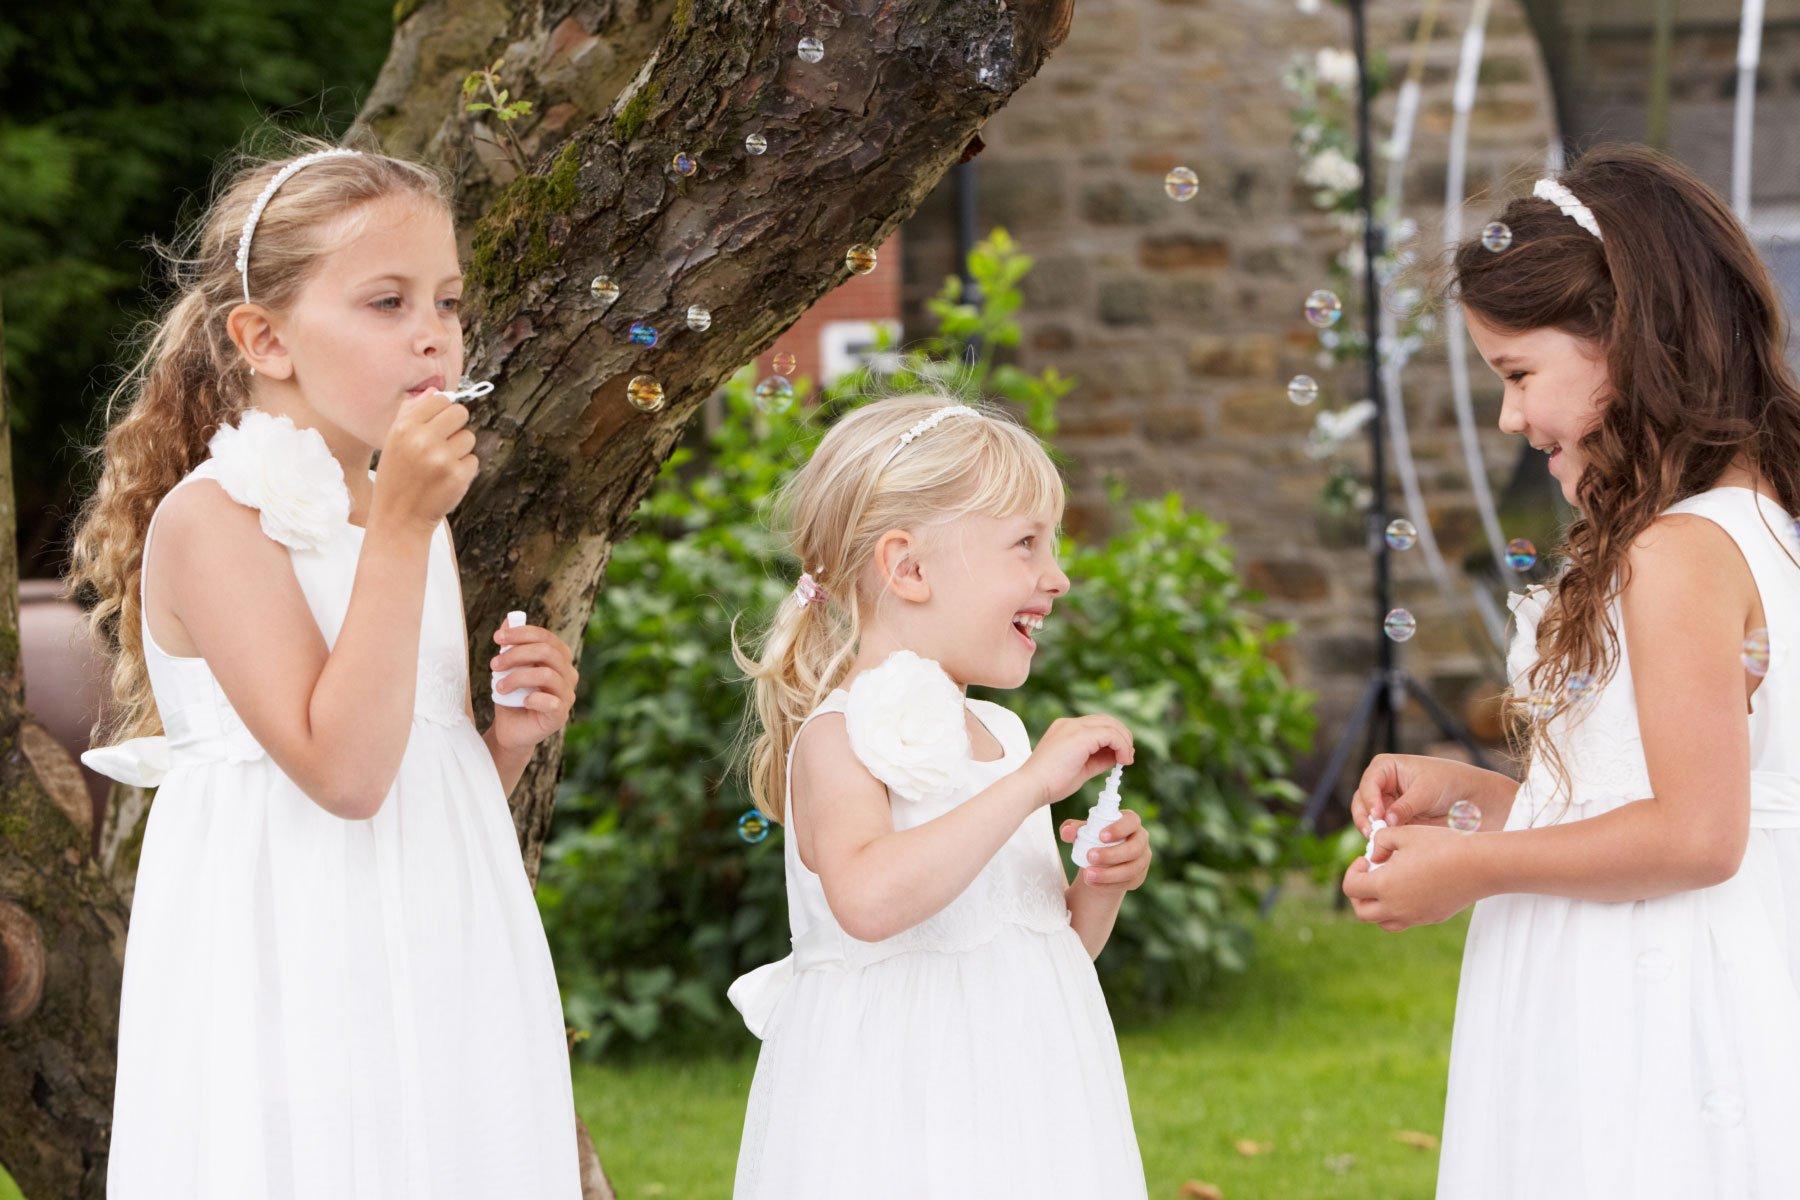 10 Ideen Um Kinder Bei Der Hochzeit Zu Beschaftigen